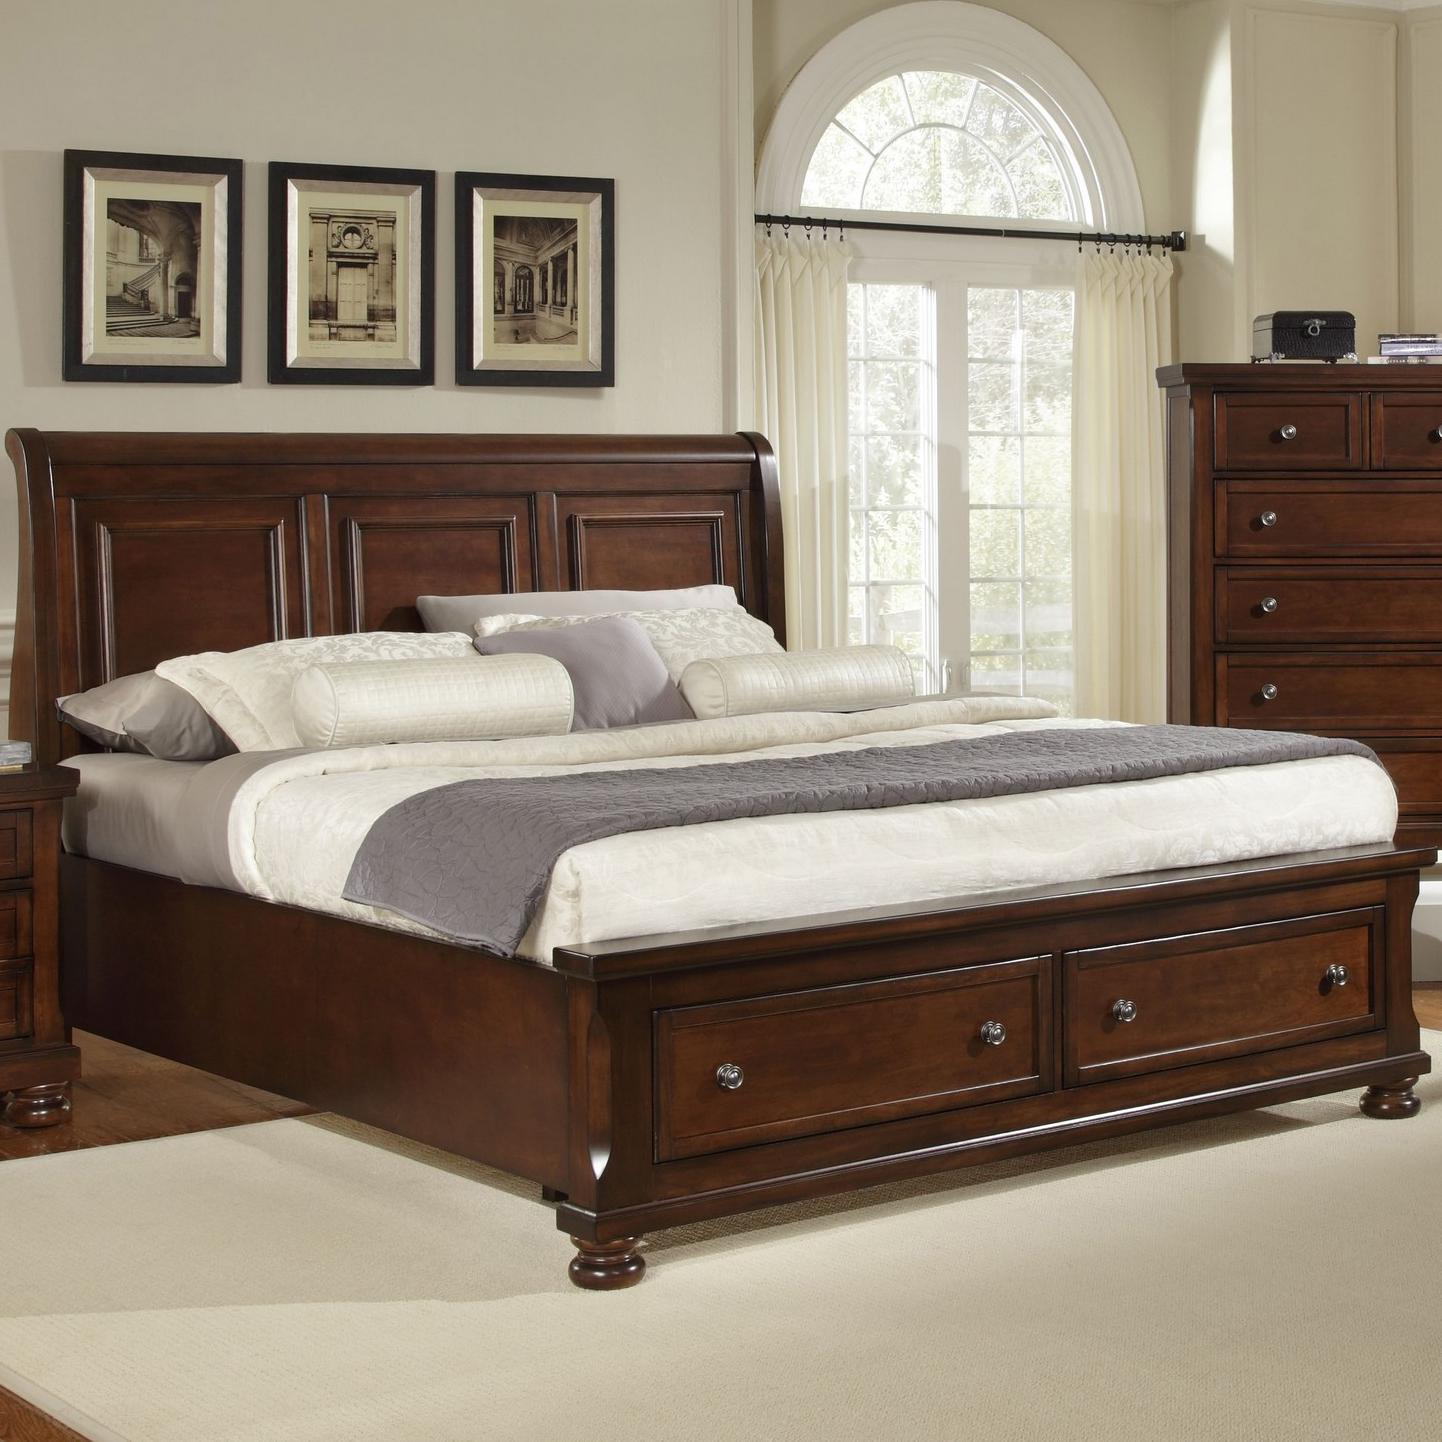 harrington king storage bed with sleigh headboard